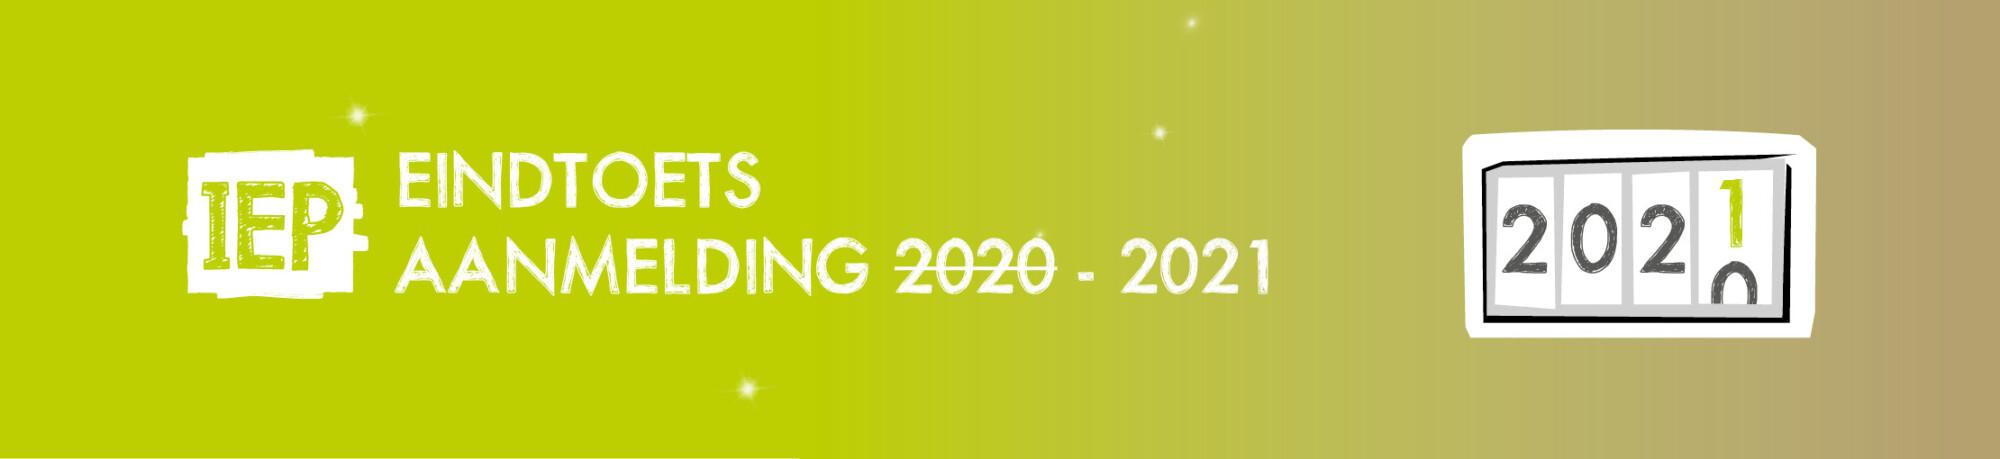 IEP Eindtoets 2021